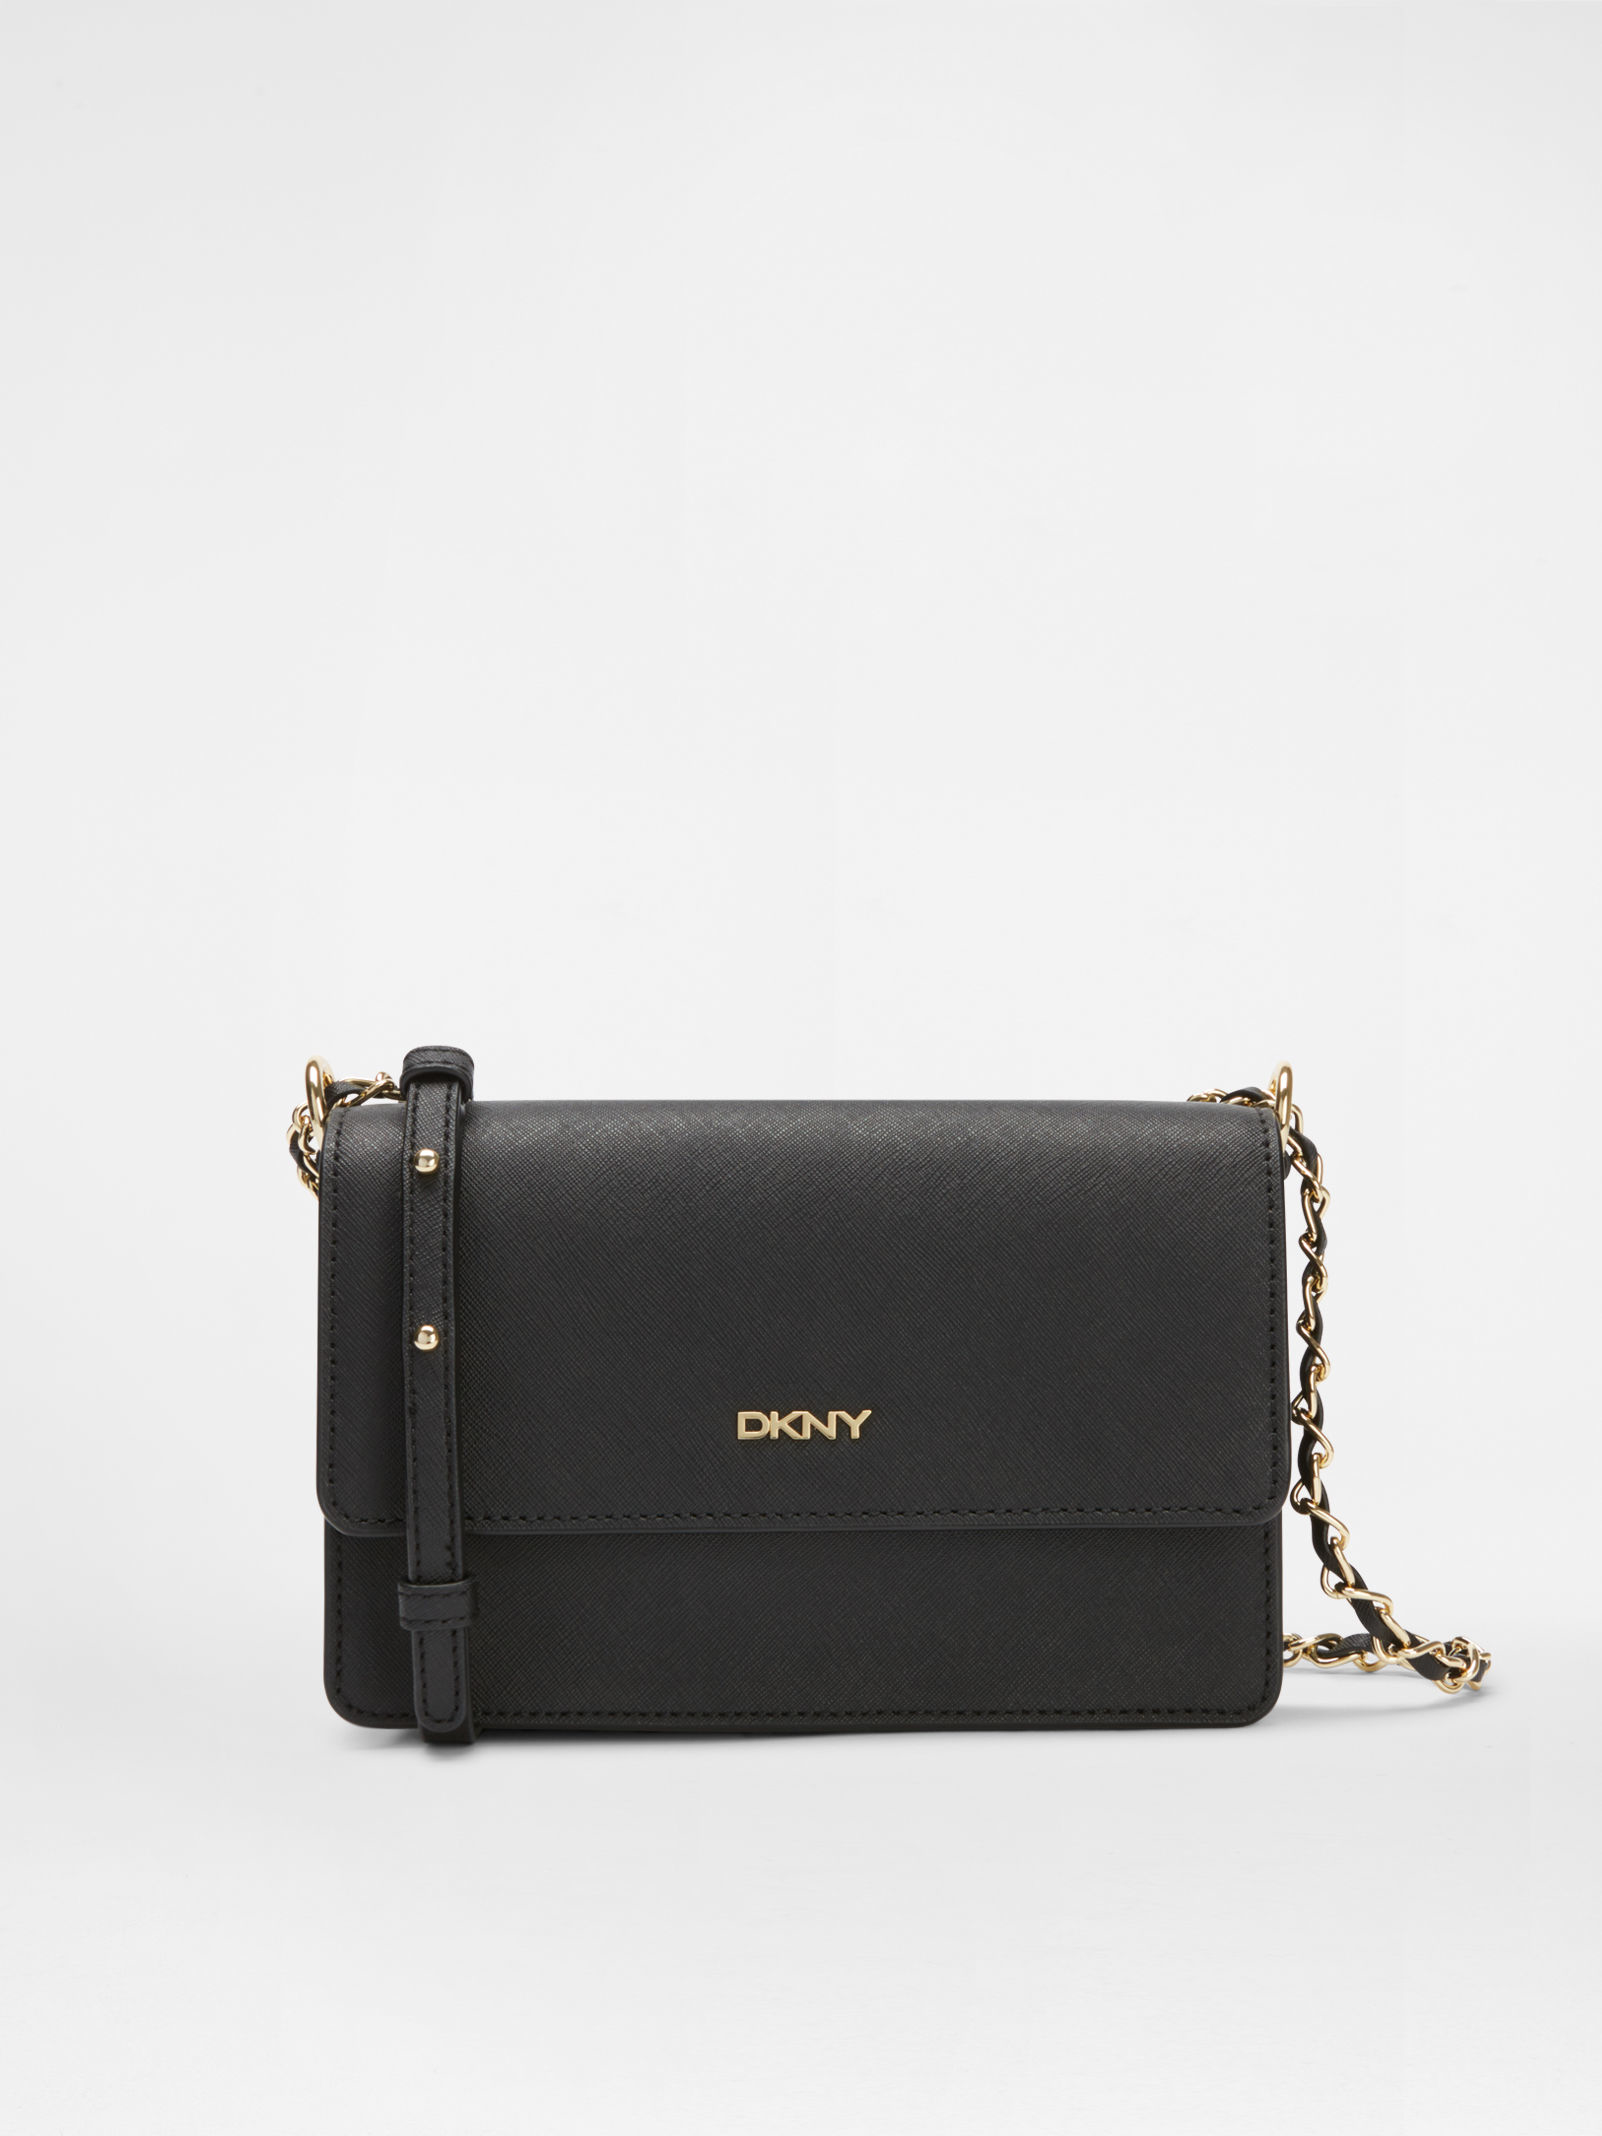 Lyst - DKNY Chain Crossbody in Black 054764591c920